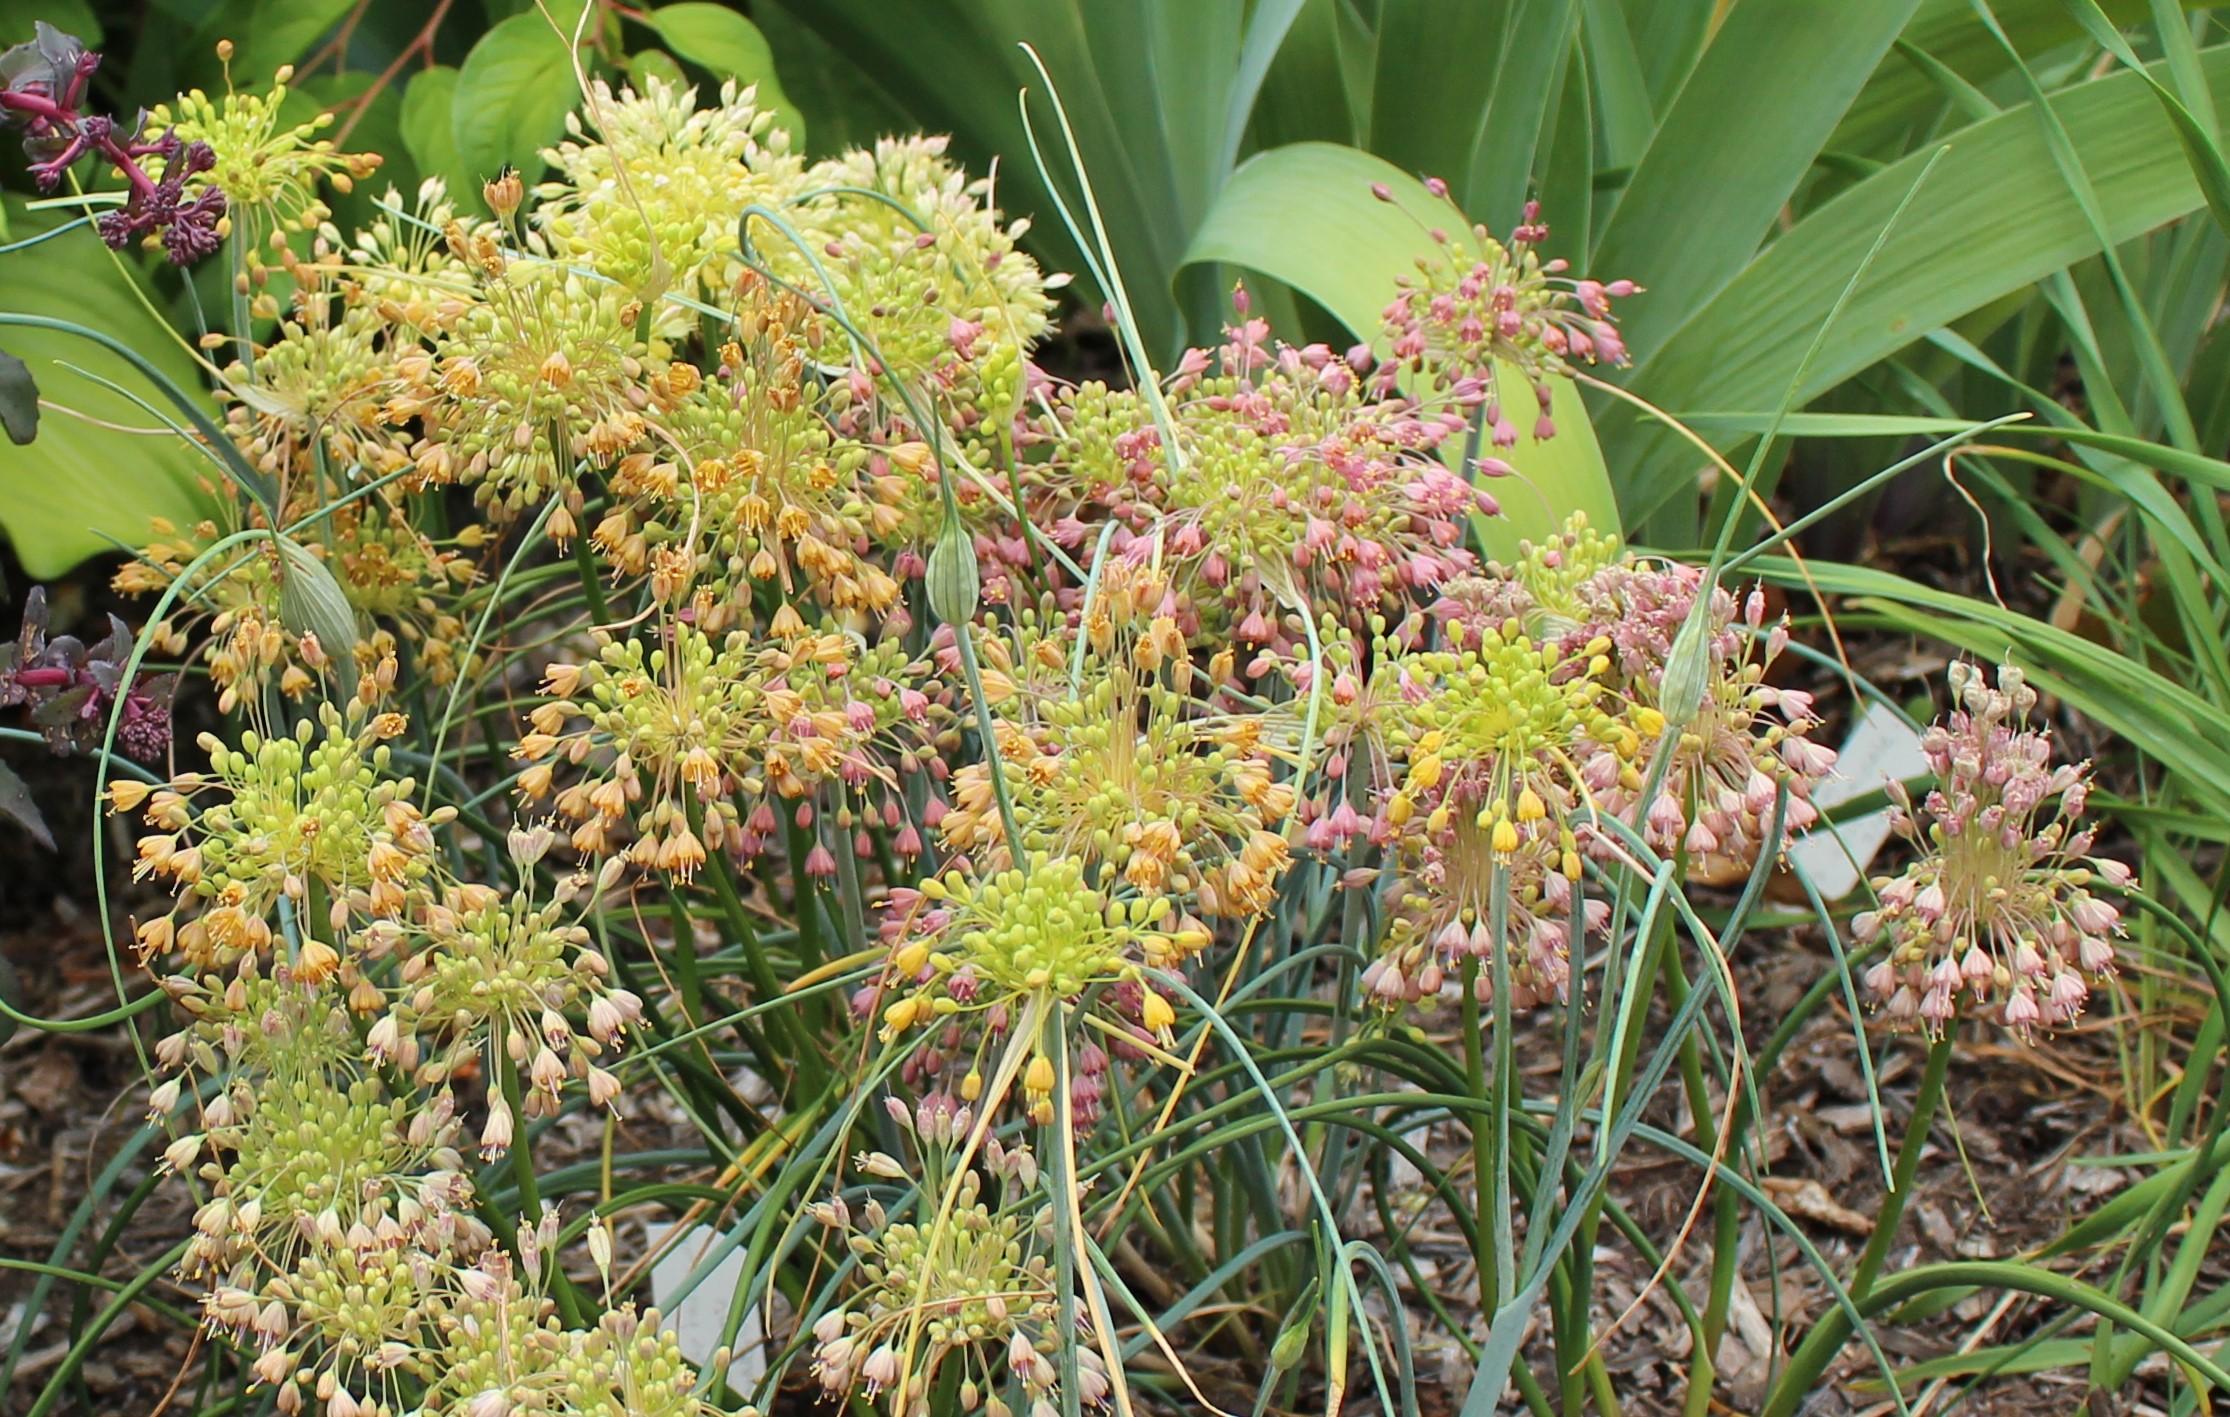 Thursdays Feature Allium Flavum Ssp Tauricum Sorta Like Suburbia